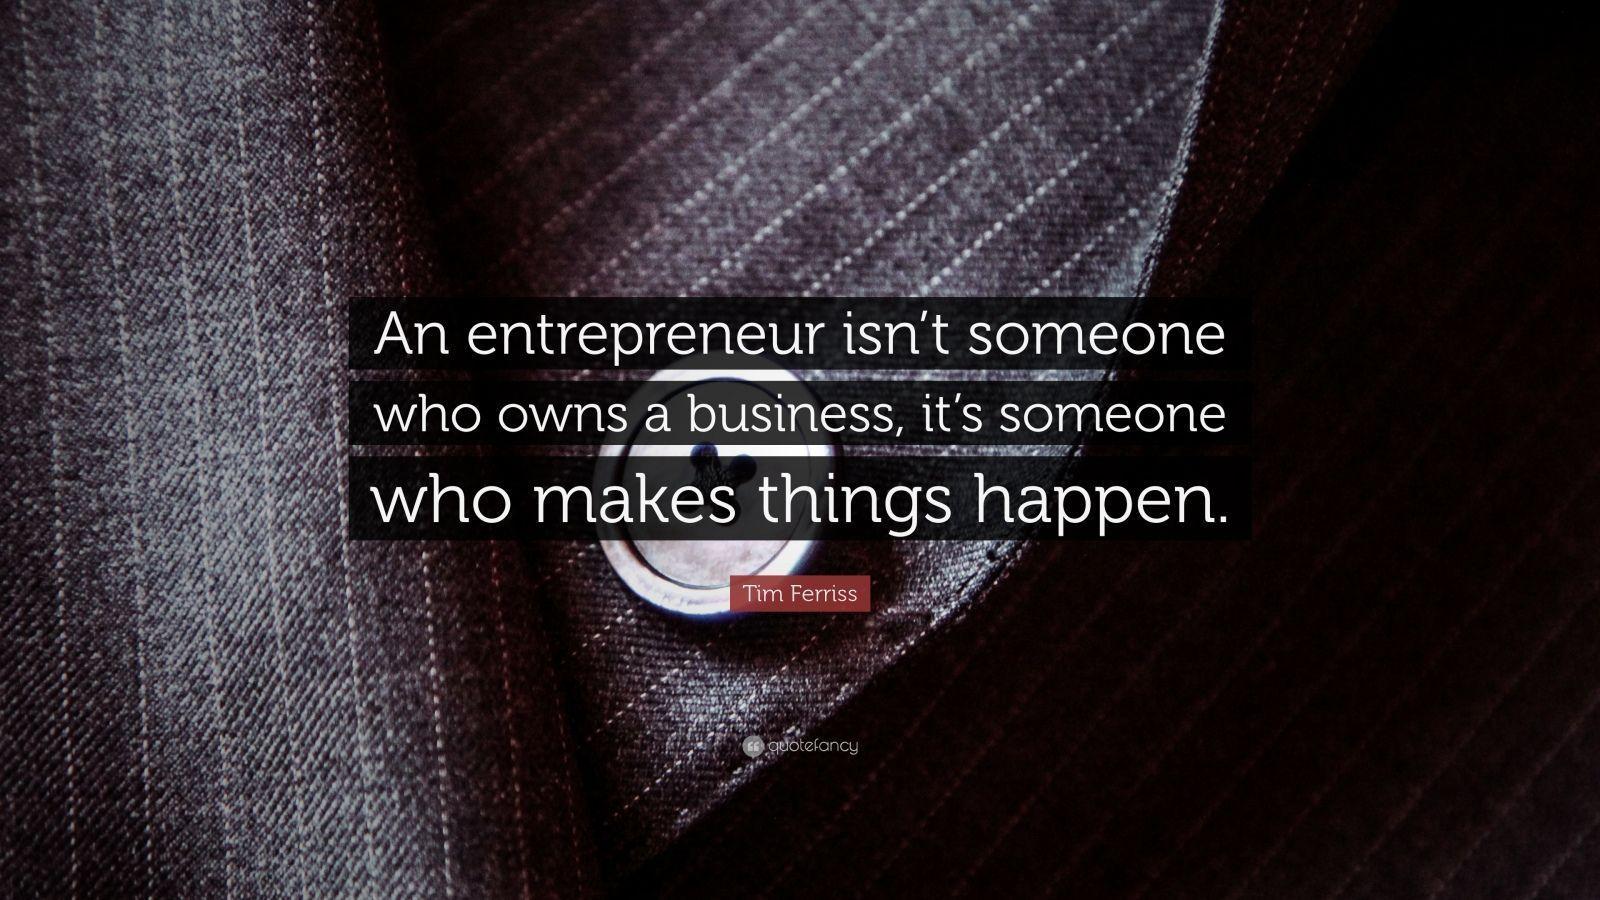 Entrepreneur wallpapers wallpaper cave - Entrepreneur wallpaper ...